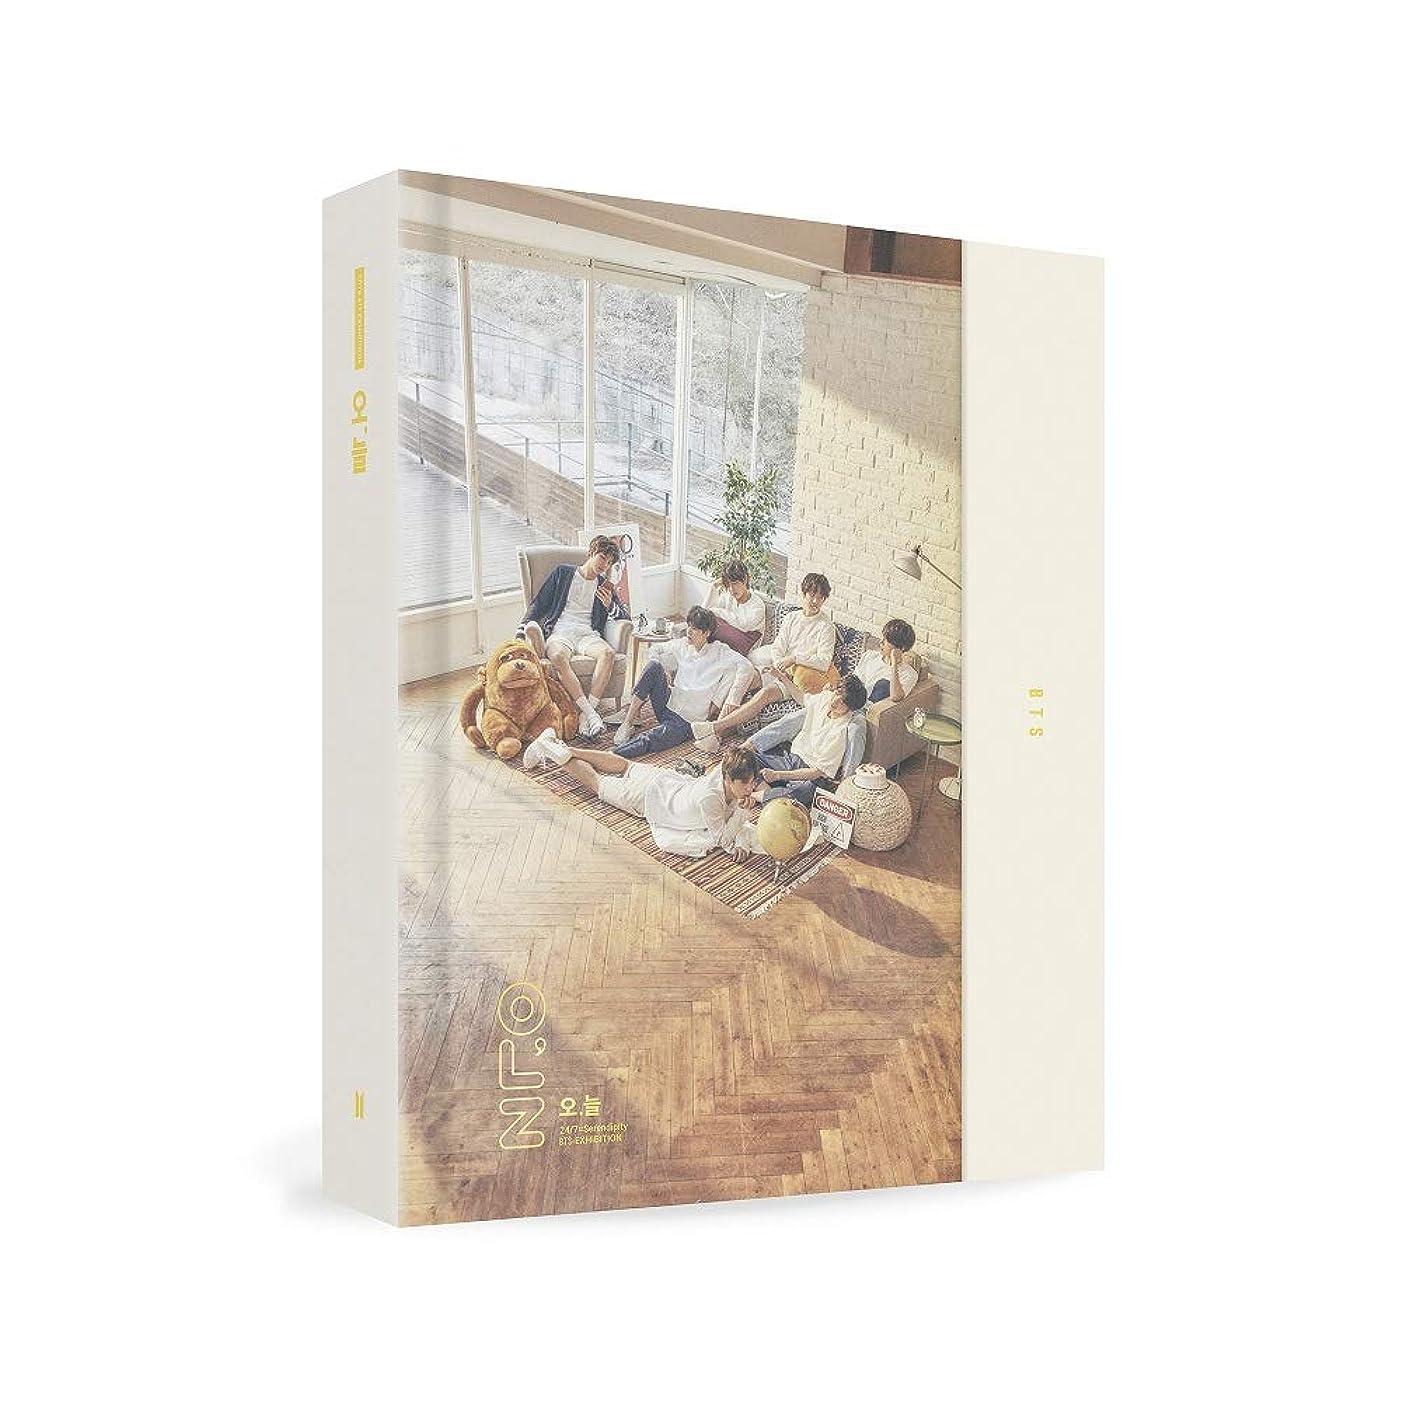 BigHit Ent BTS Exhibition Book 2018 [?,?] Exhibition Book + Photo Set + Random Sticker + Extra Photocards Set